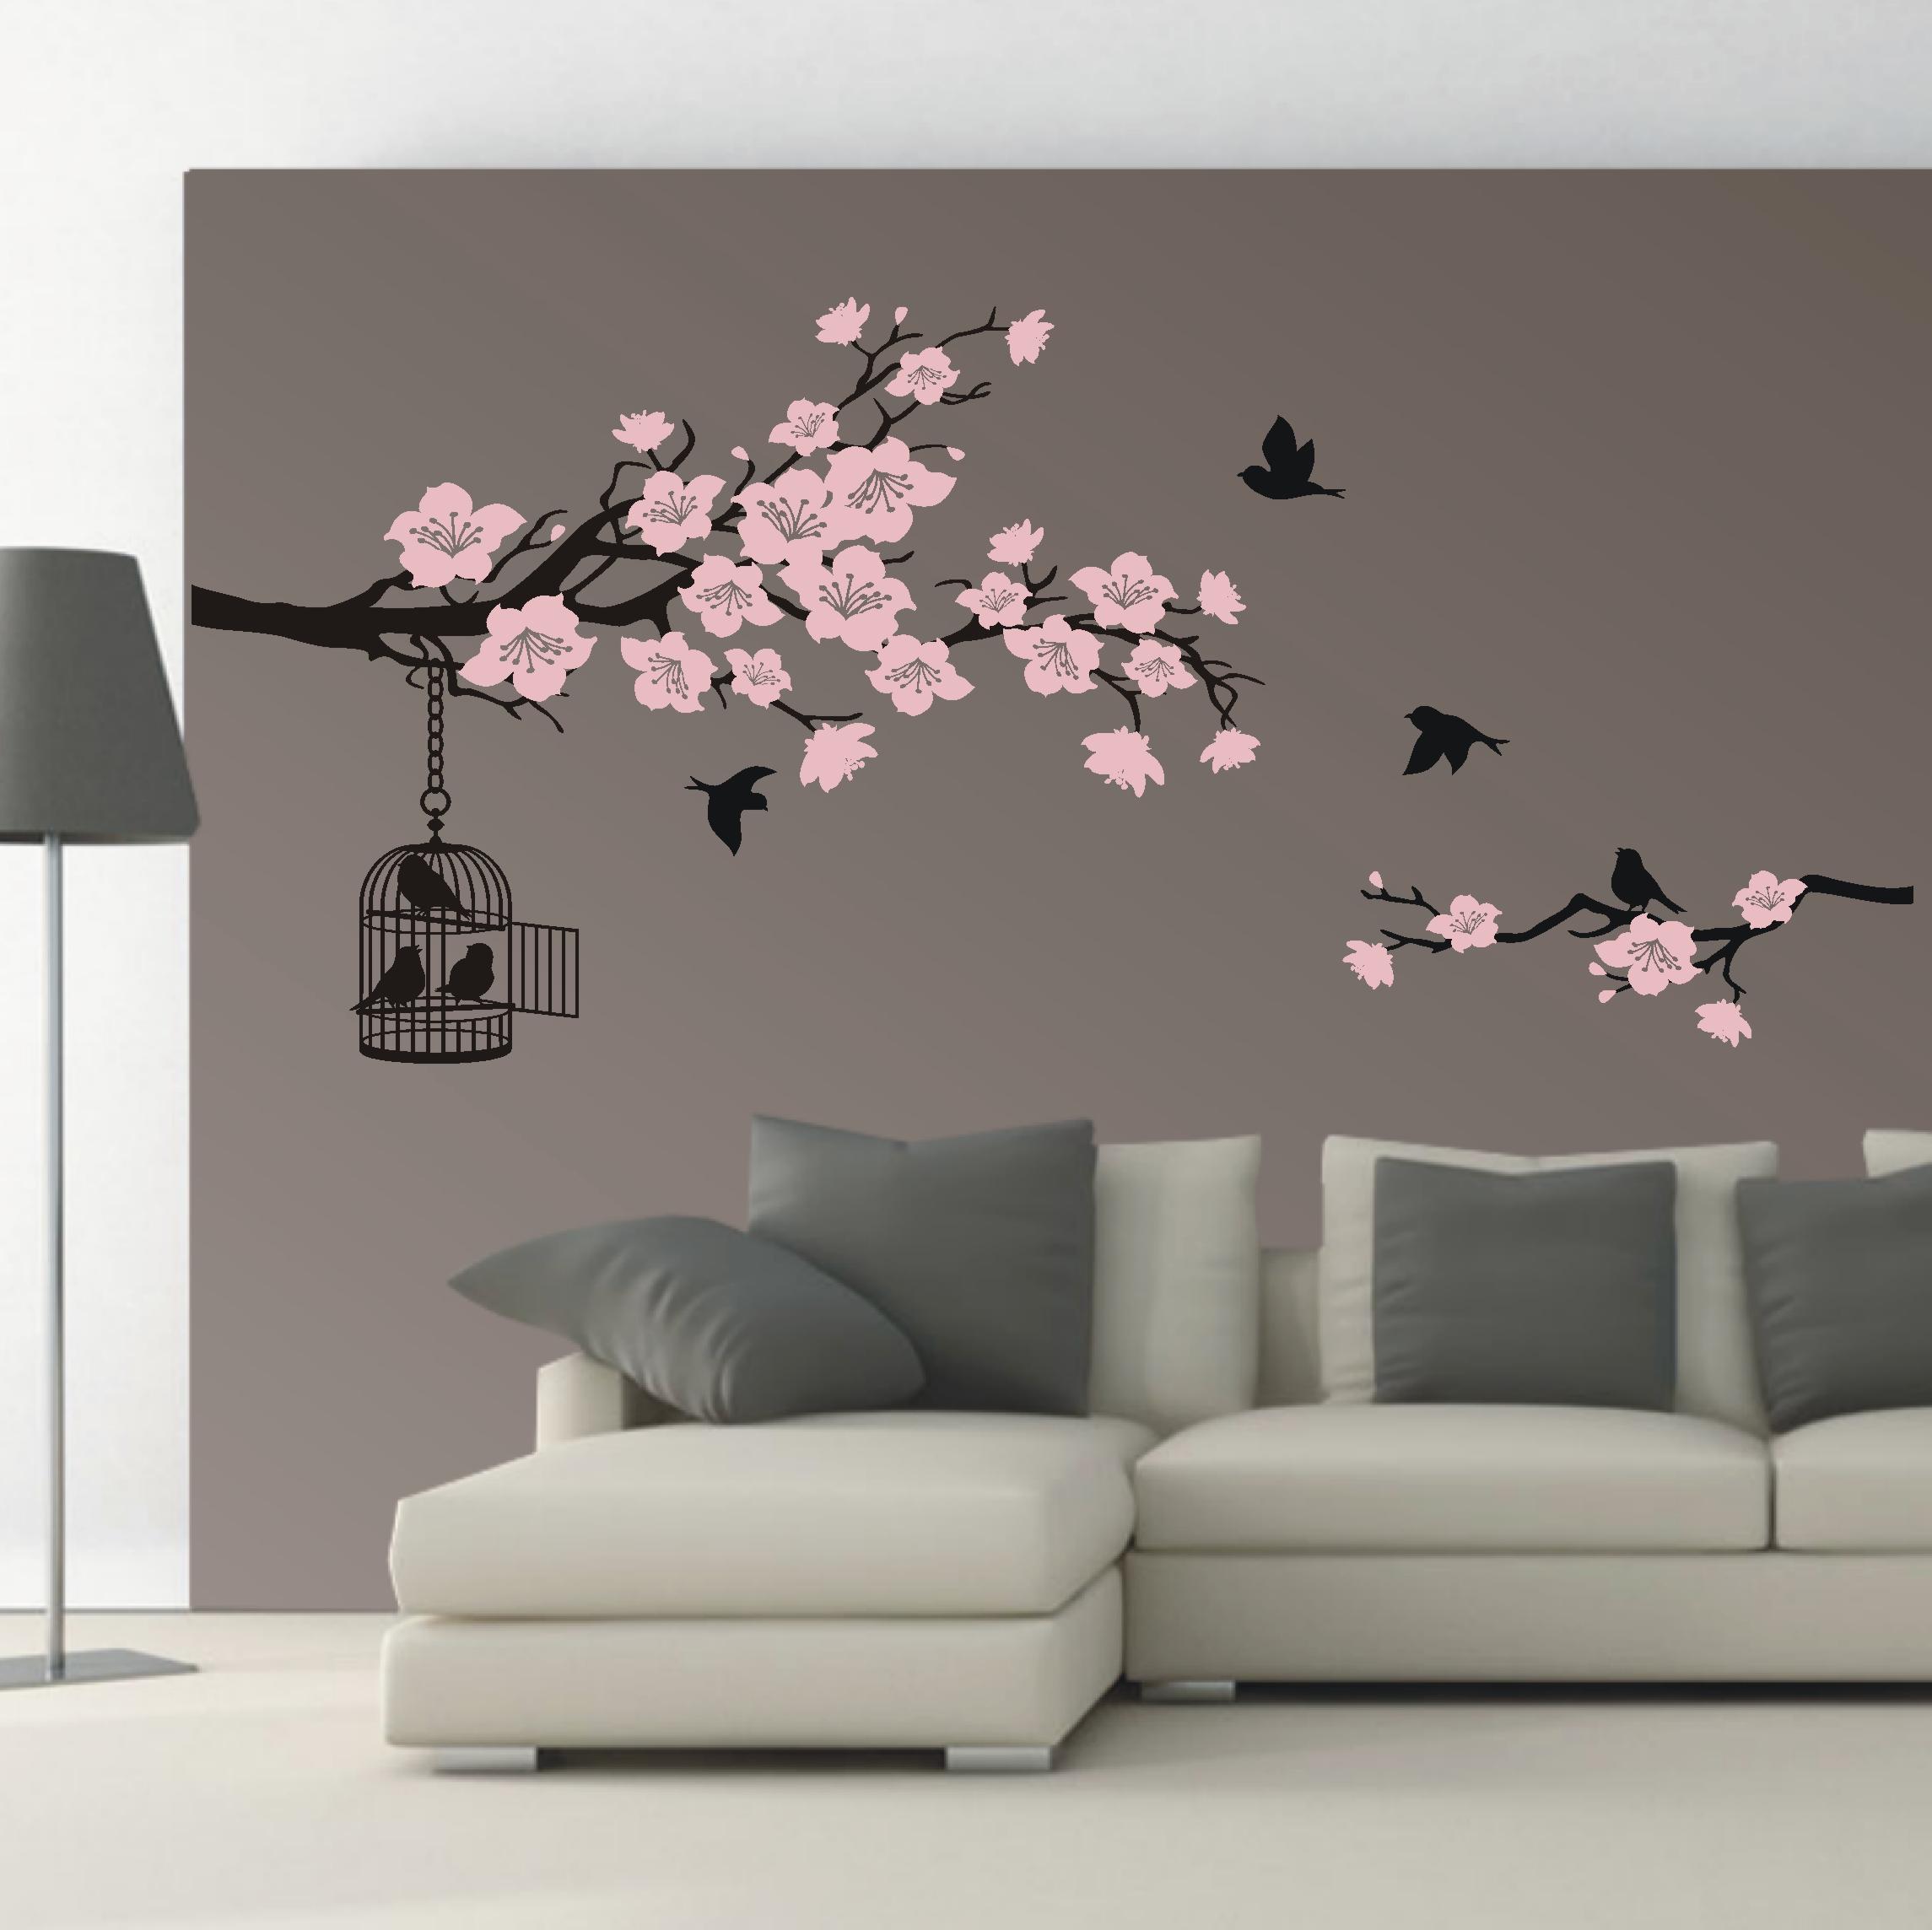 deko shop wandtattoo kirschbl ten ast 2 farbig. Black Bedroom Furniture Sets. Home Design Ideas